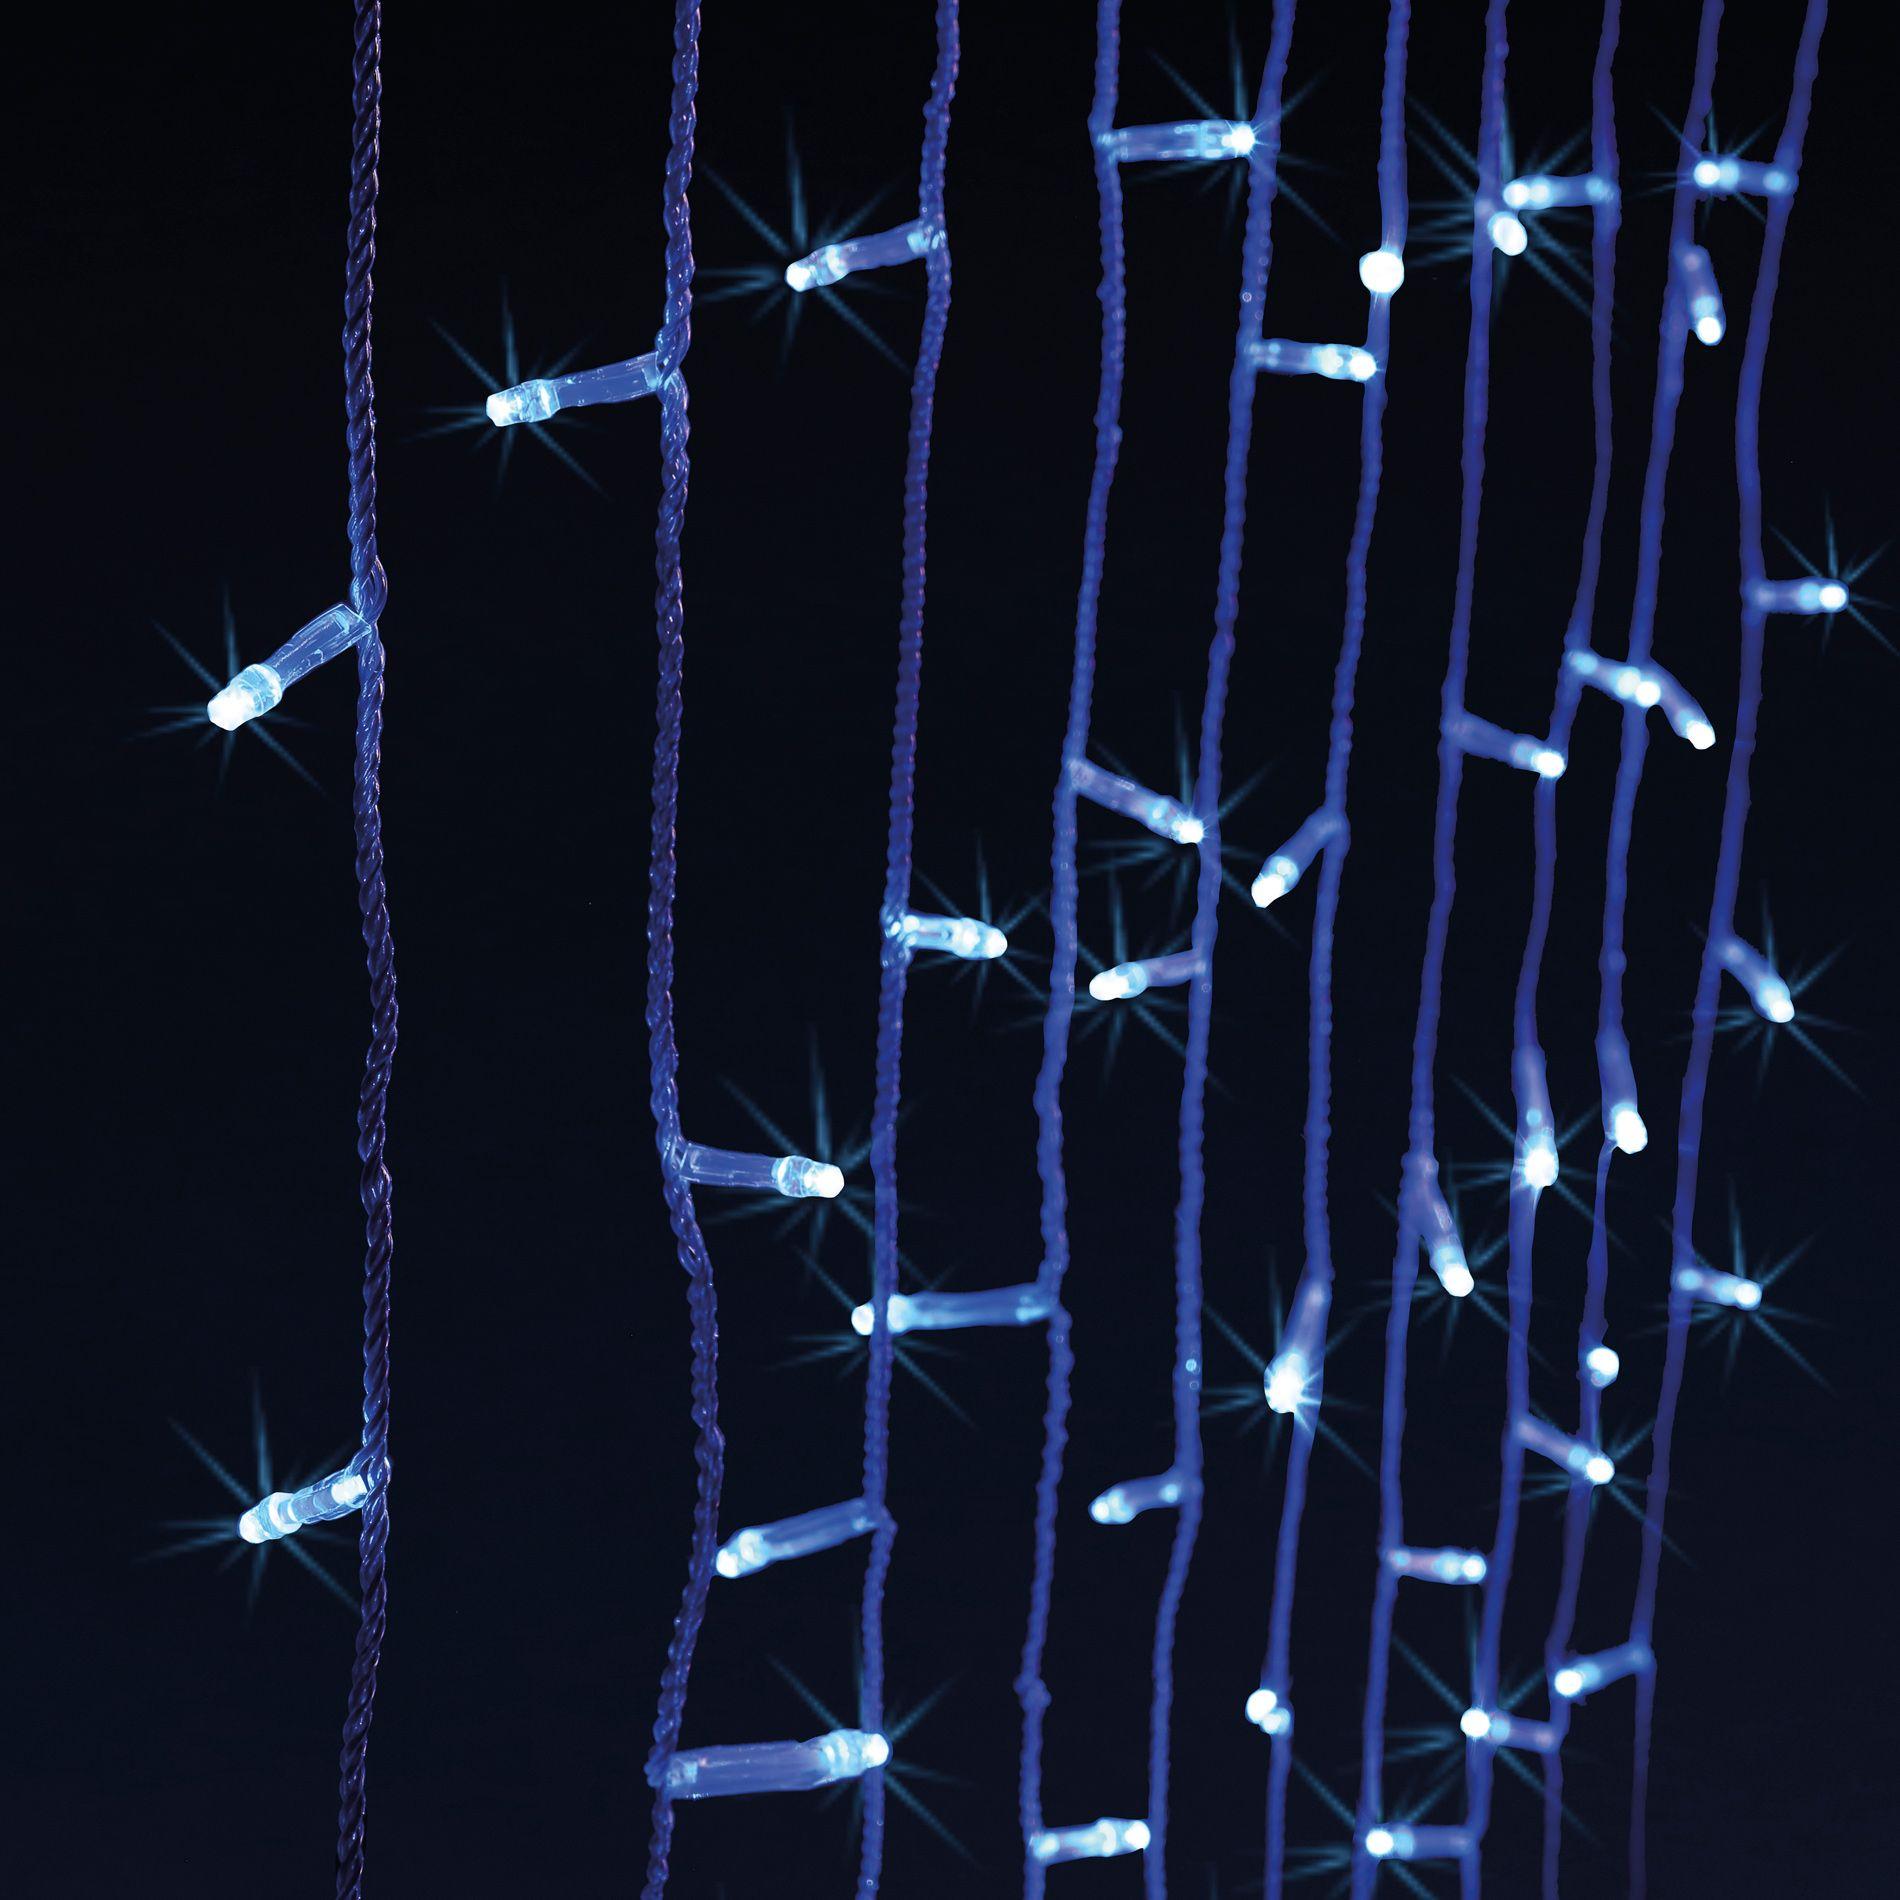 rideau lumineux h1 40 m bleu 150 led guirlande lumineuse eminza. Black Bedroom Furniture Sets. Home Design Ideas